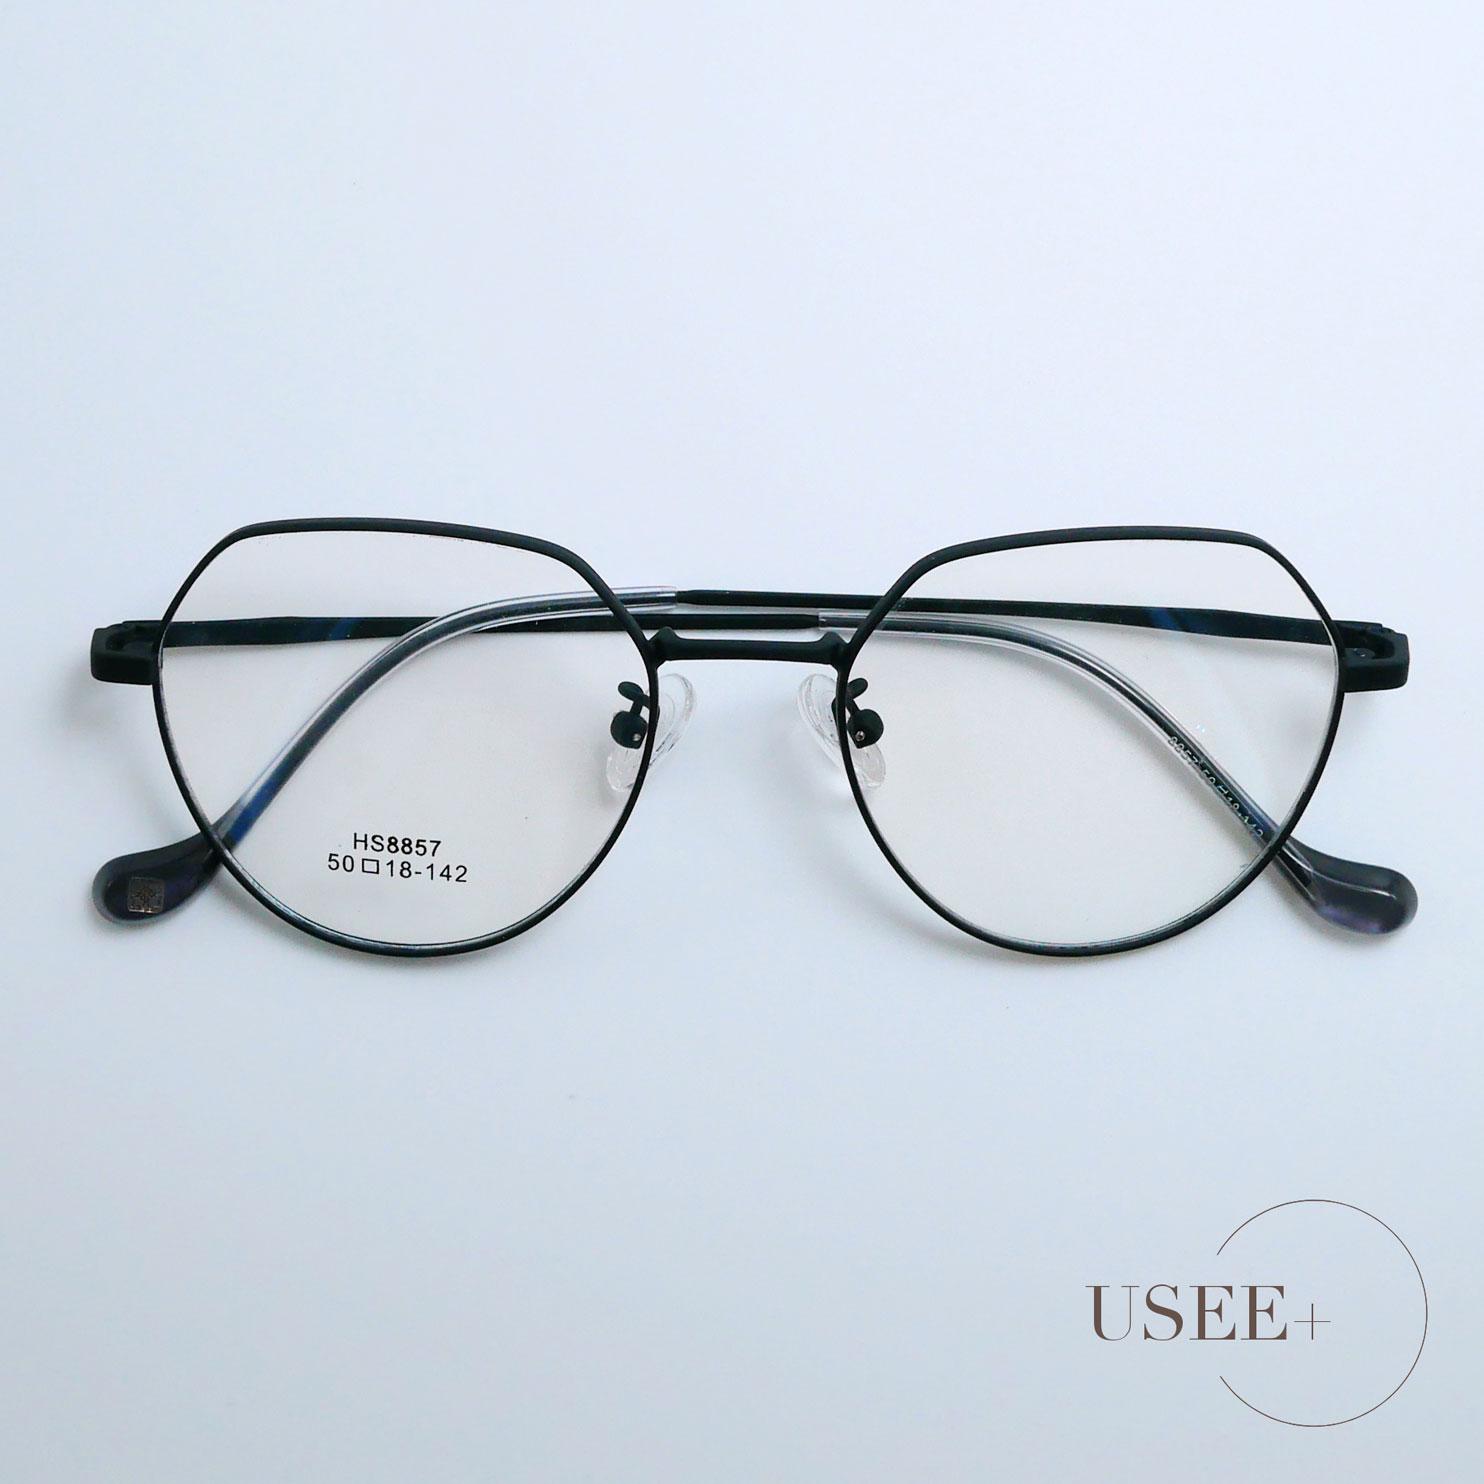 USEE+ 有晰眼镜磨砂简约时尚潮流眼镜